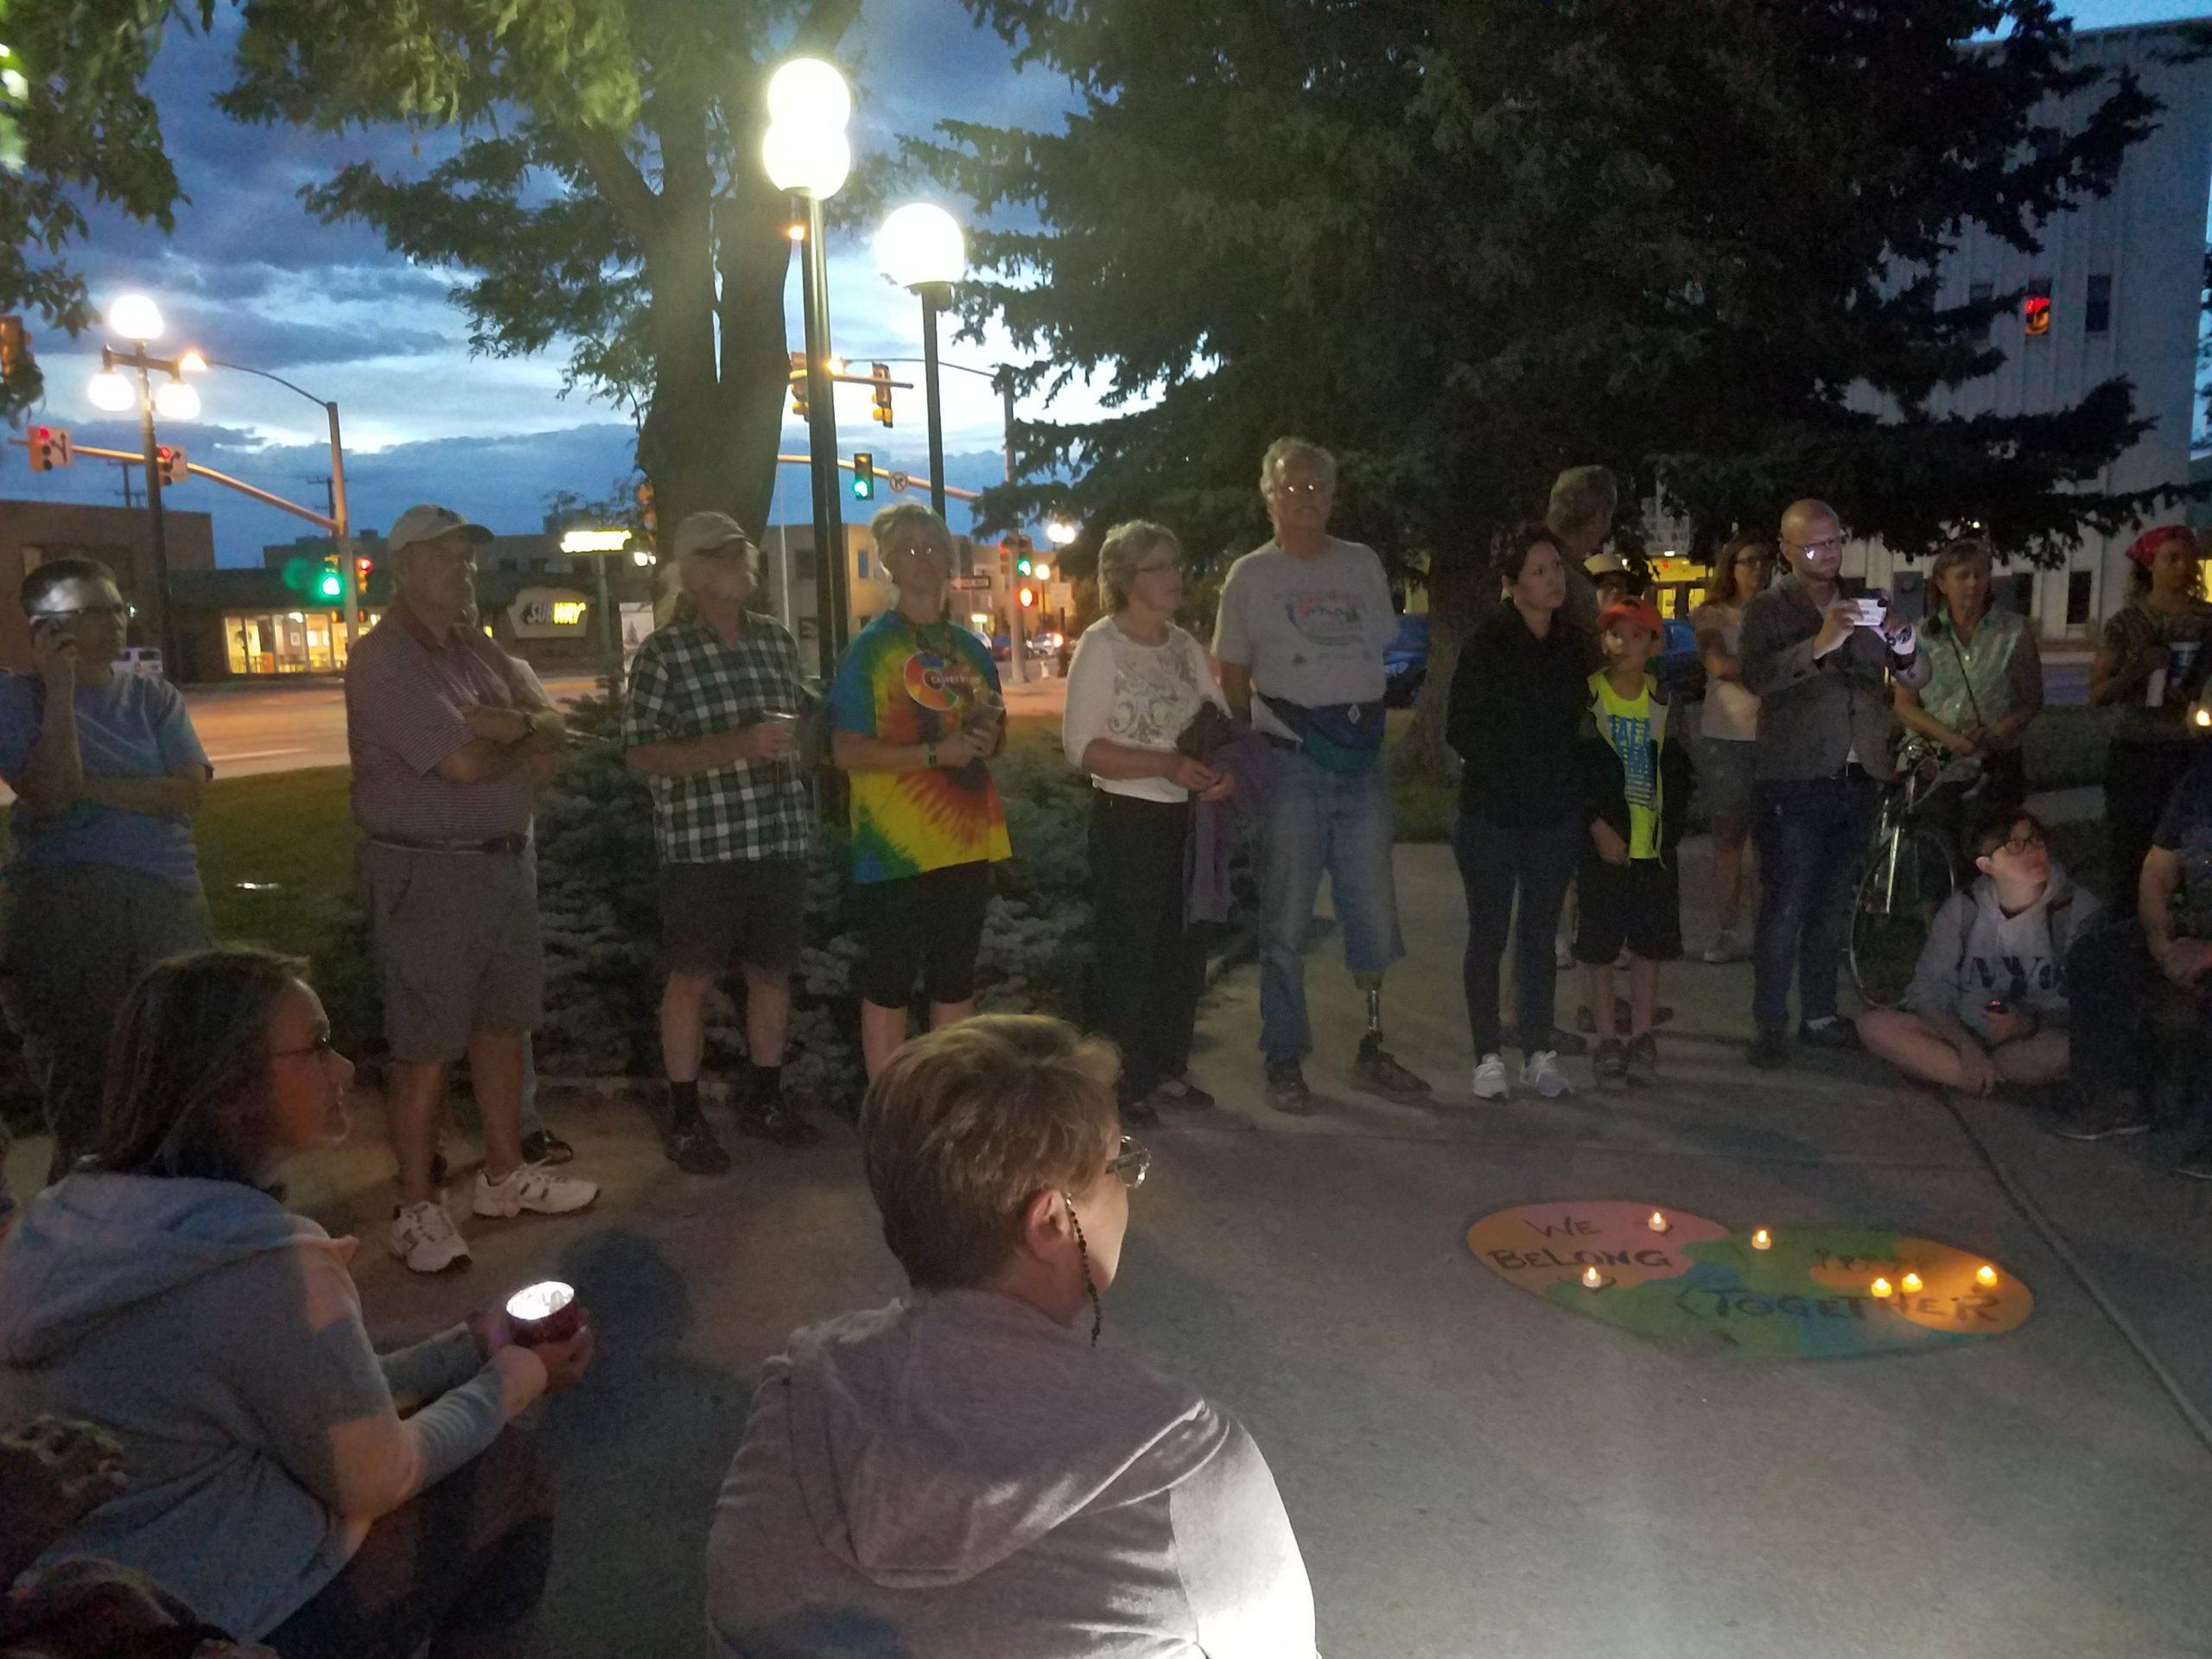 Casper, Wyo., Lights for Liberty vigil, 7/12/19